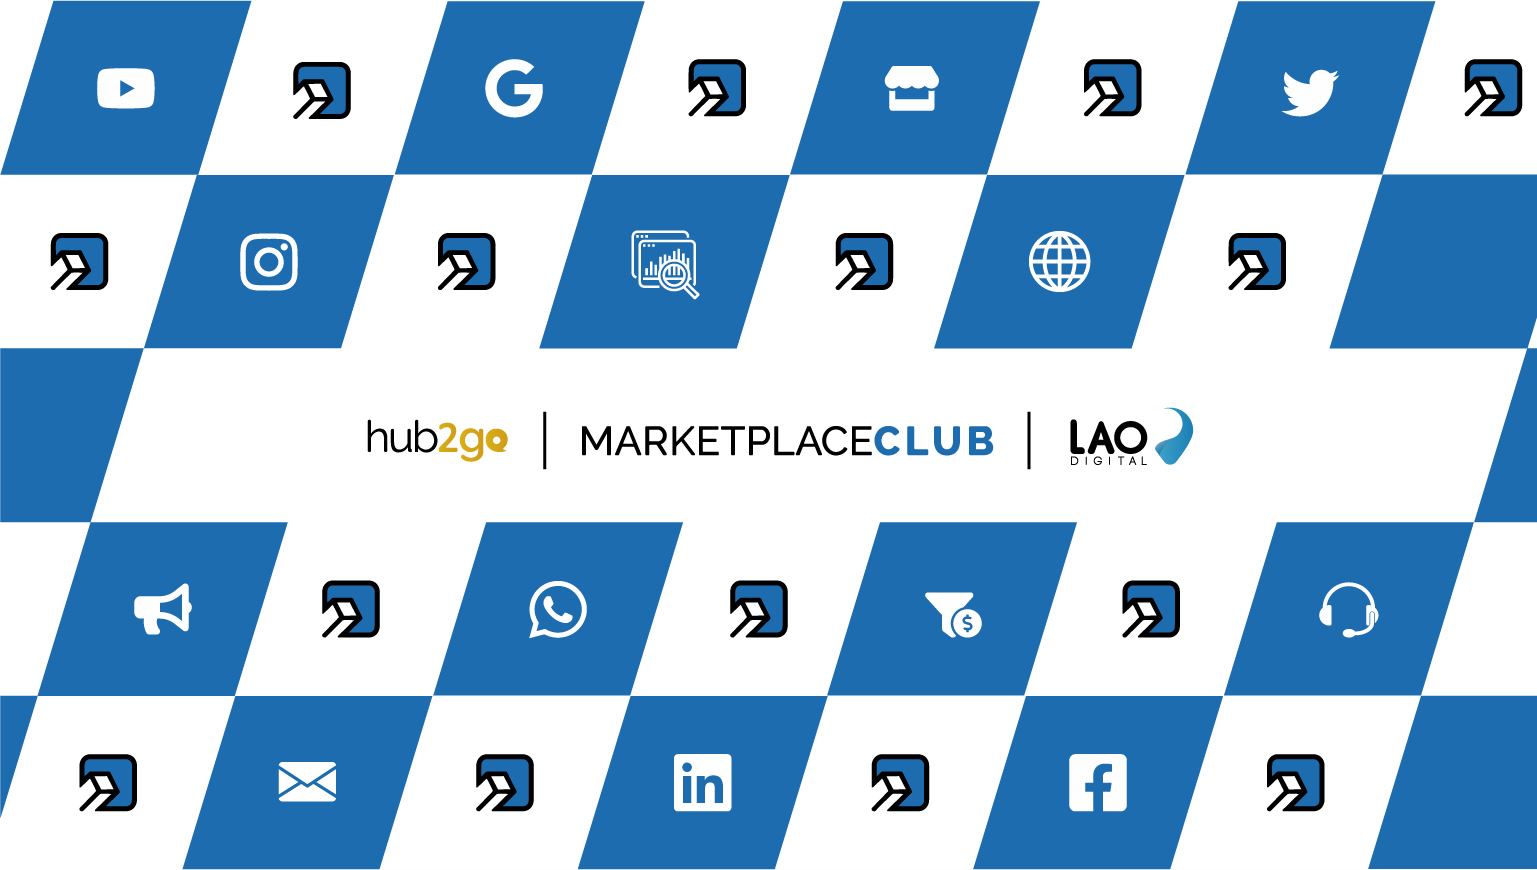 Marketplace Club